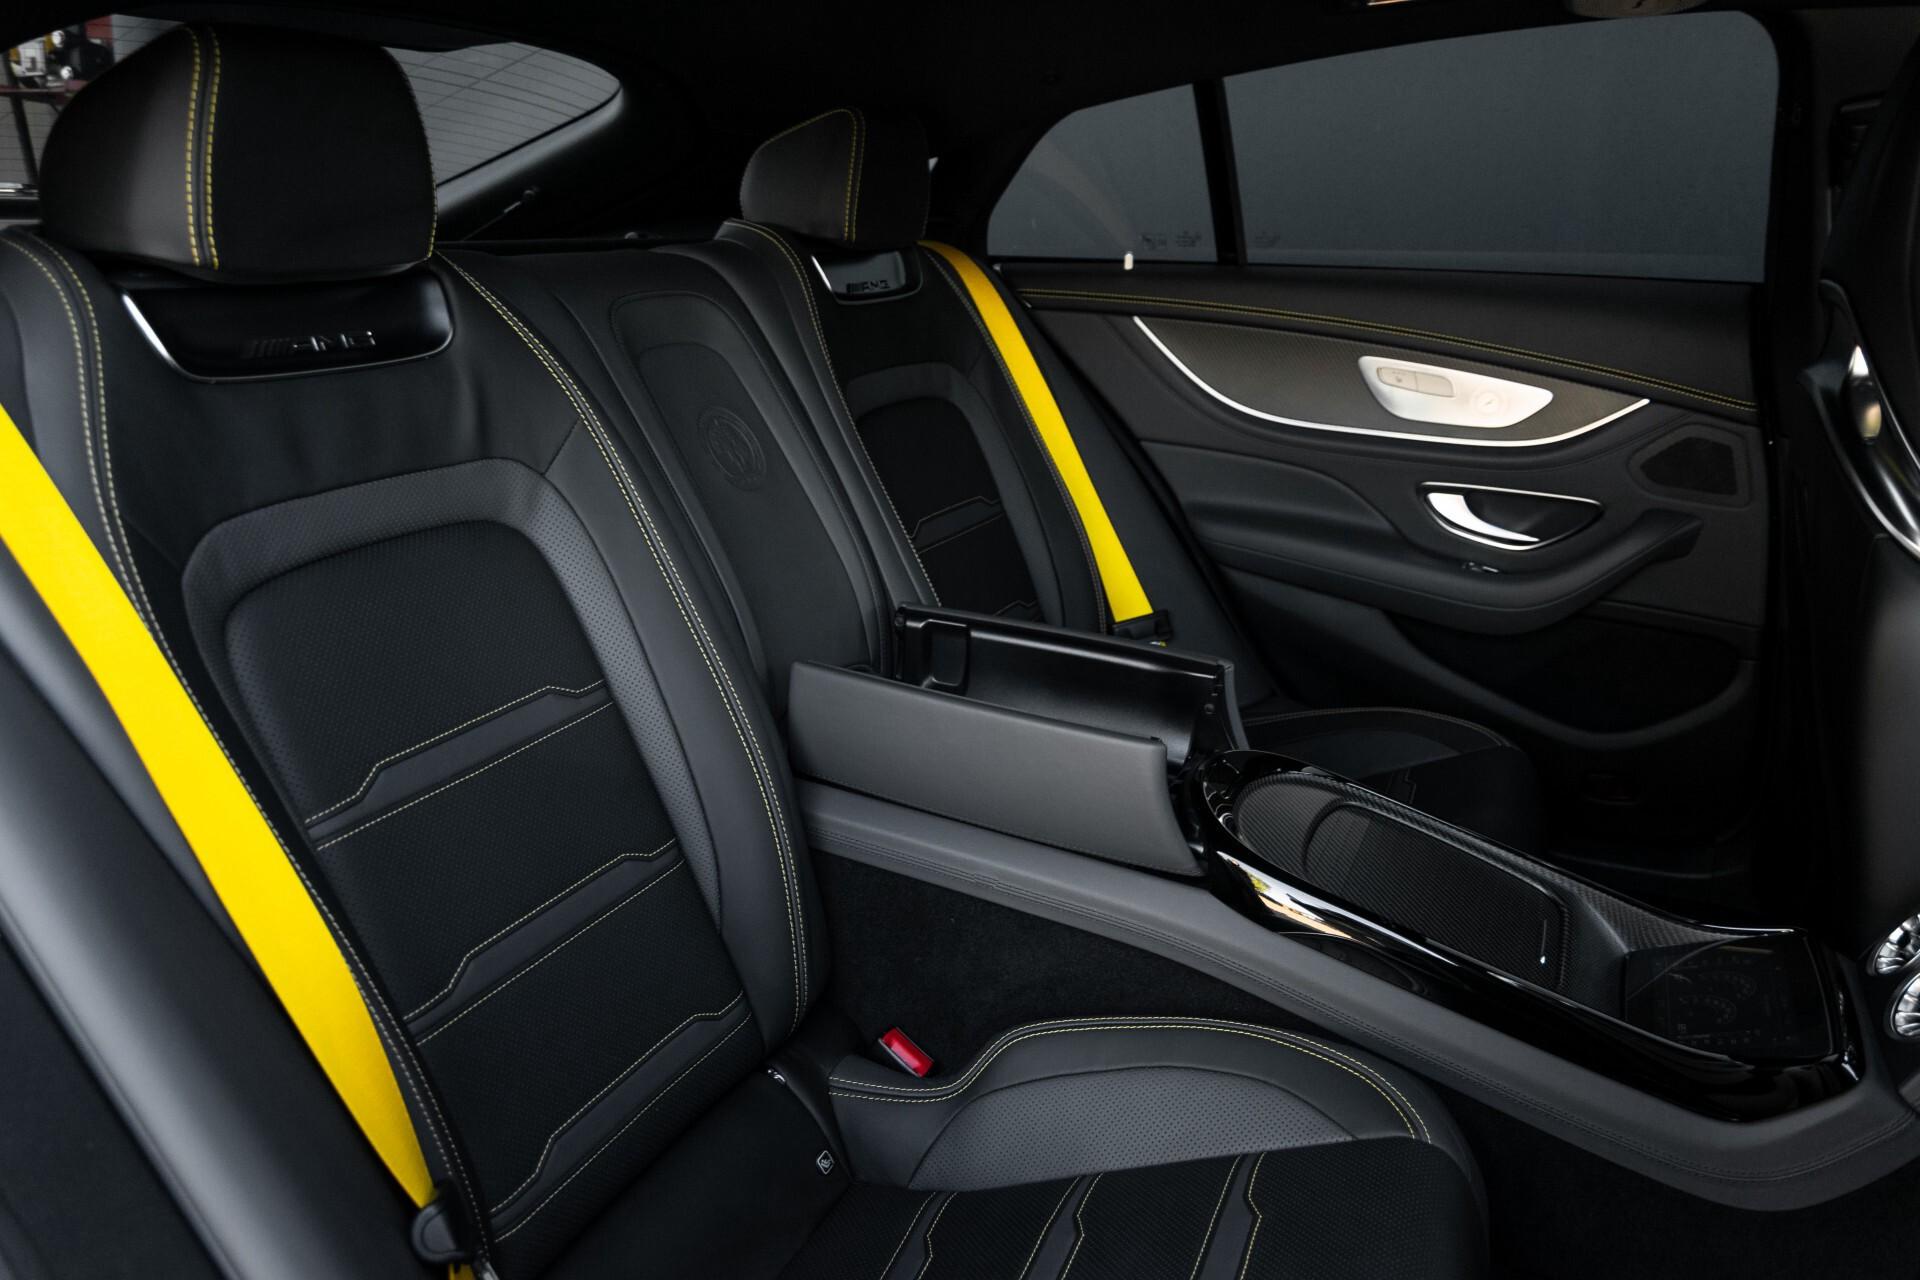 Mercedes-Benz AMG GT 4-Door Coupe 63 S 4MATIC+ Edition 1 Keramisch/Carbon/First Class/Dynamic Plus/Burmester High End 3D Aut9 Foto 6